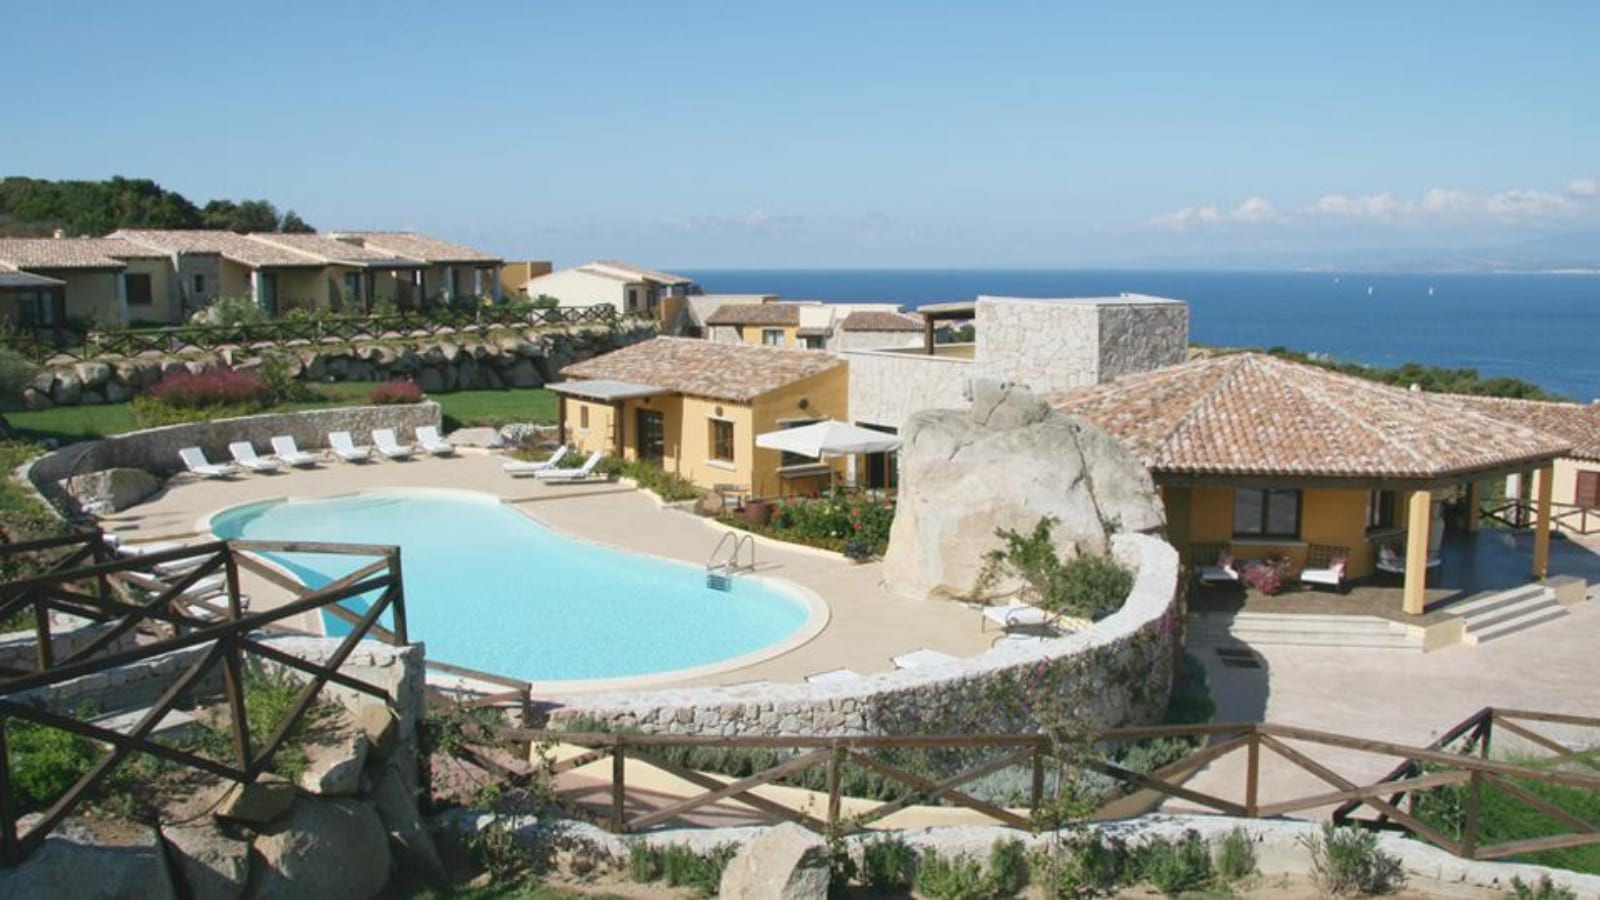 Supertrips - Mooi vakantie appartement in Italië